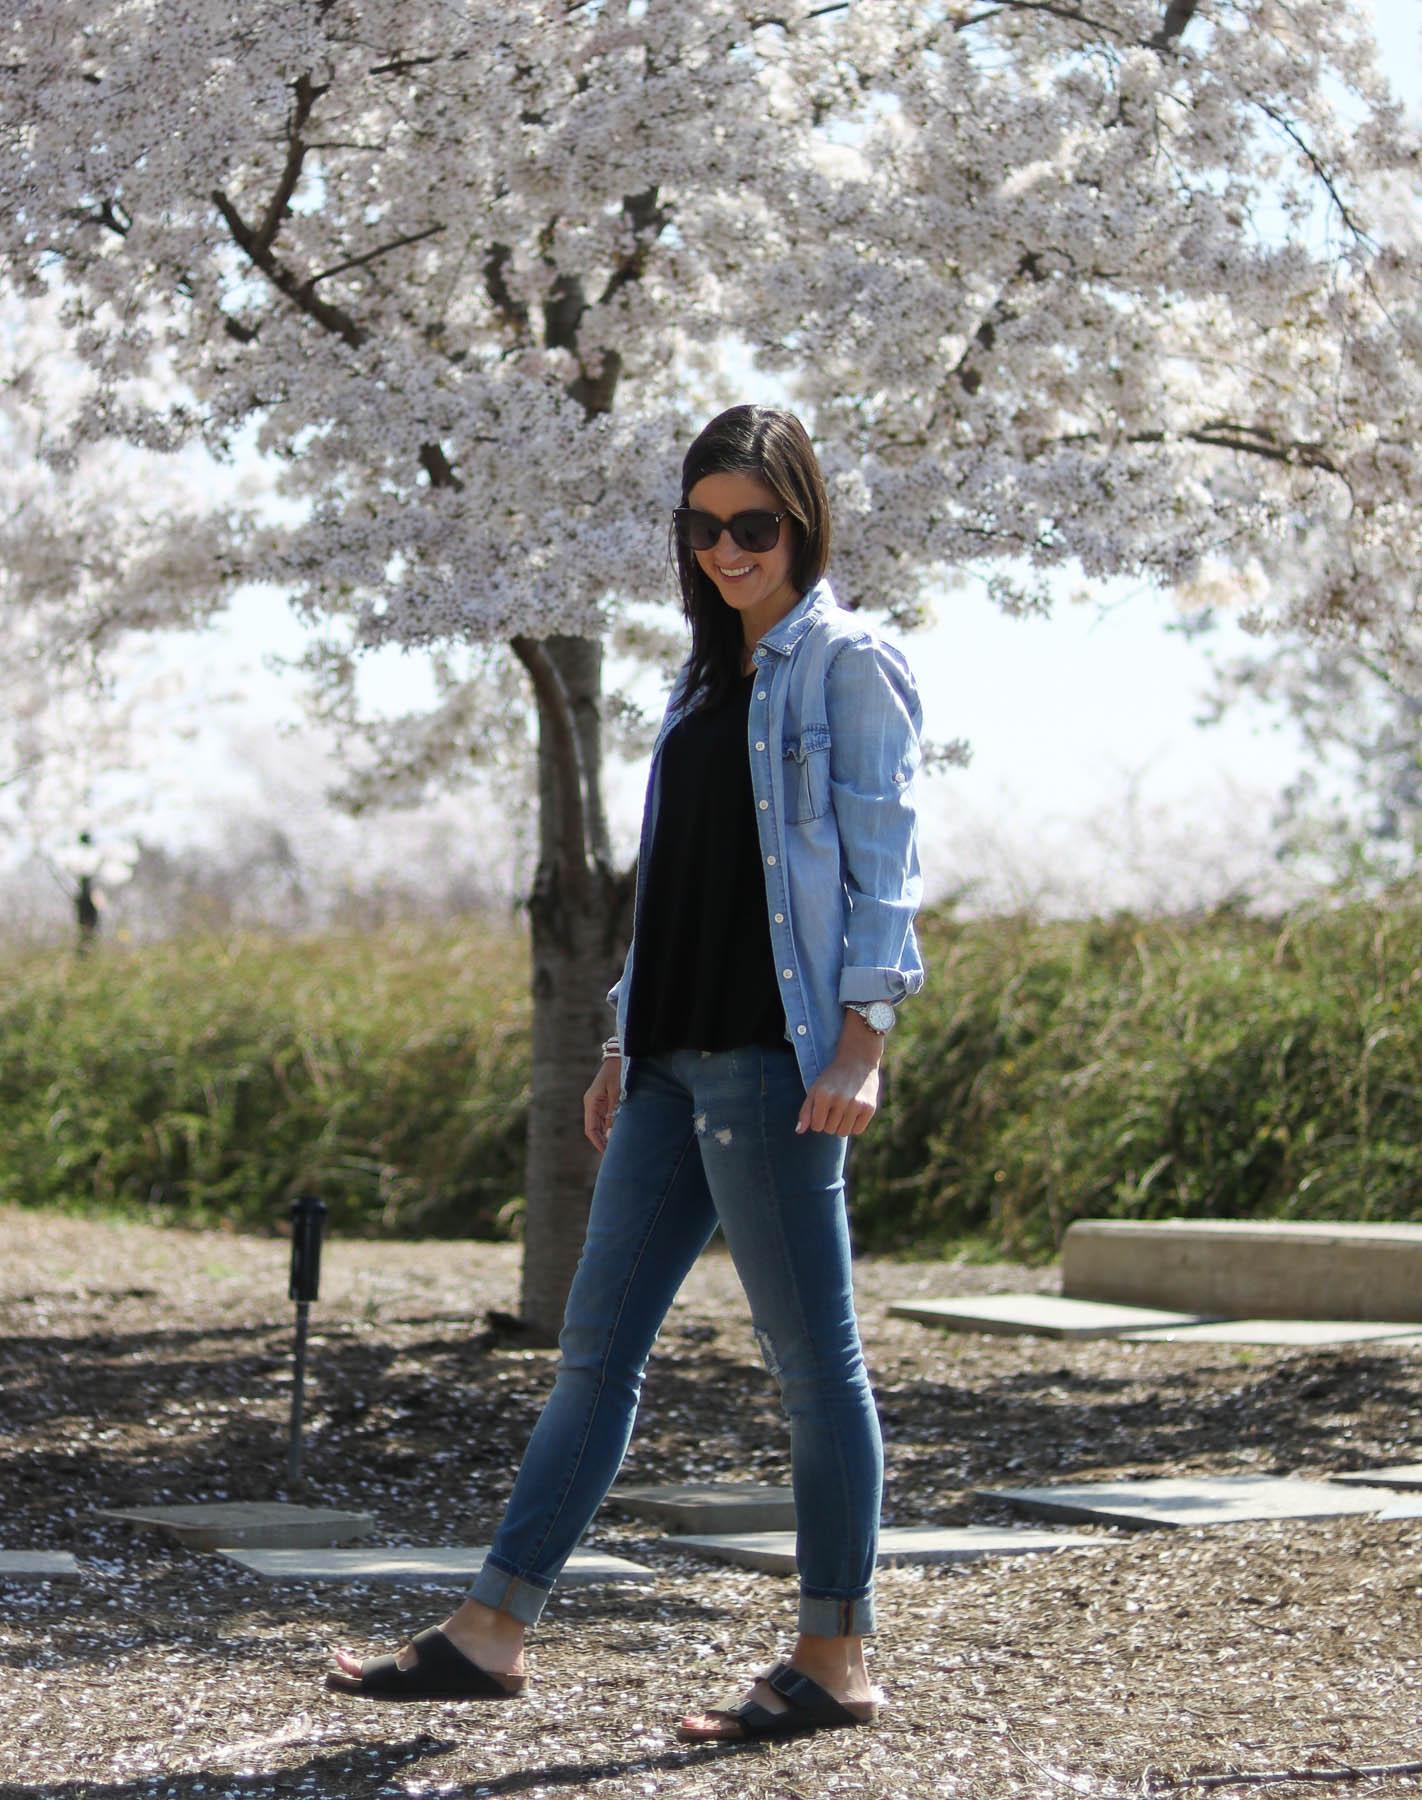 Cherry Blossom Stroll